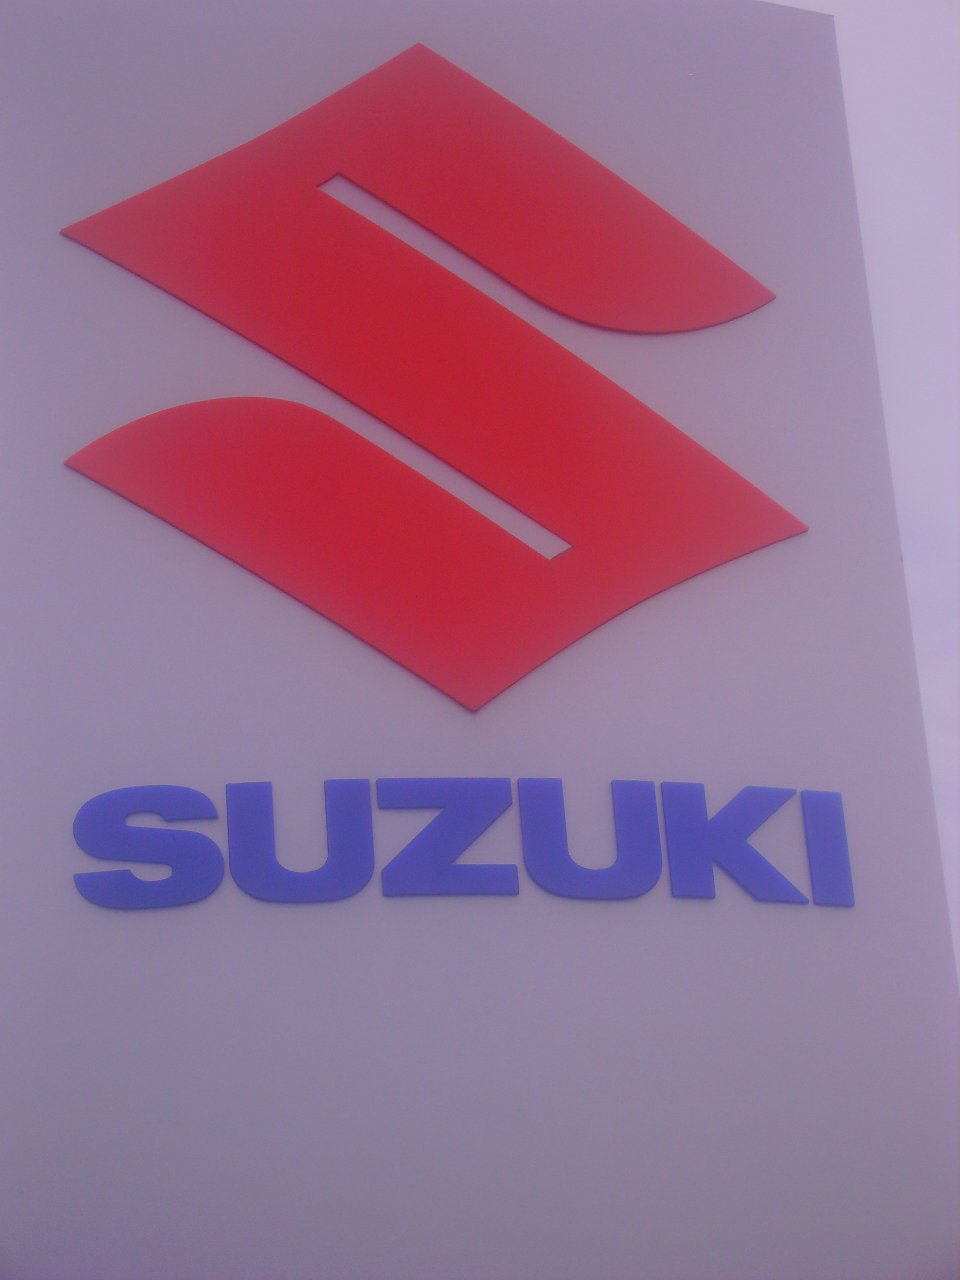 suzuki-logo-emblem